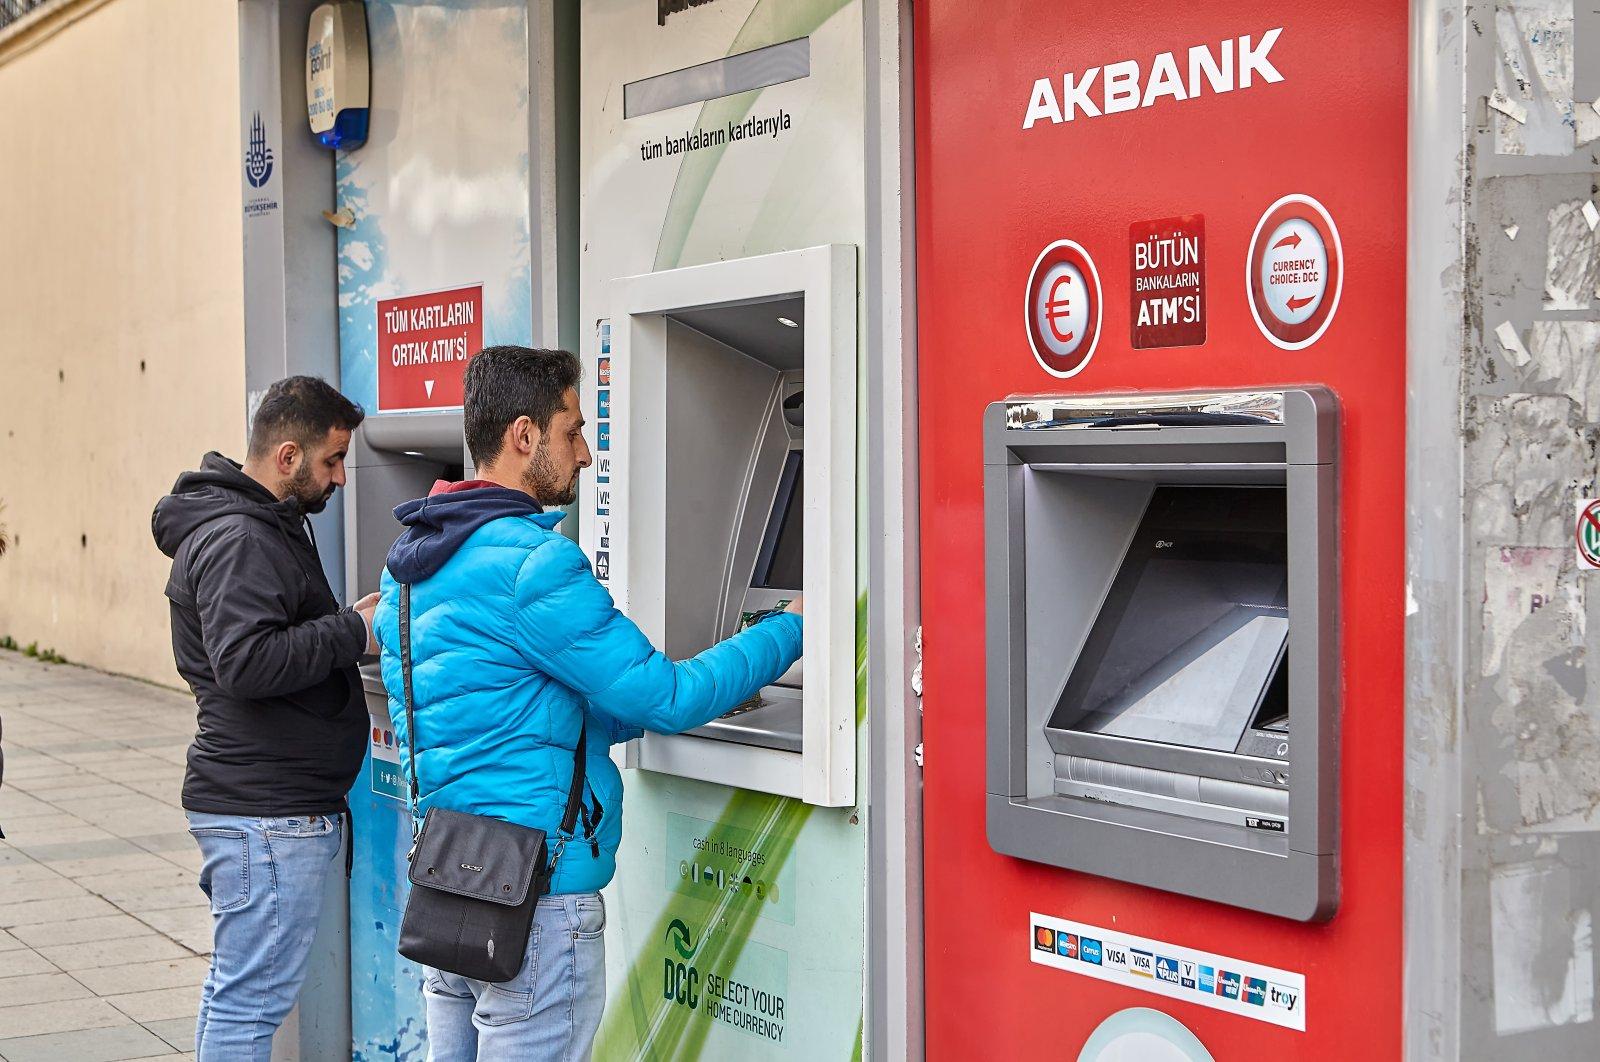 Three banks', namely, Denizbank, Akbank and Garanti bank, ATMs on a street in Istanbul, Turkey, Feb. 14, 2020. (Shutterstock Photo)